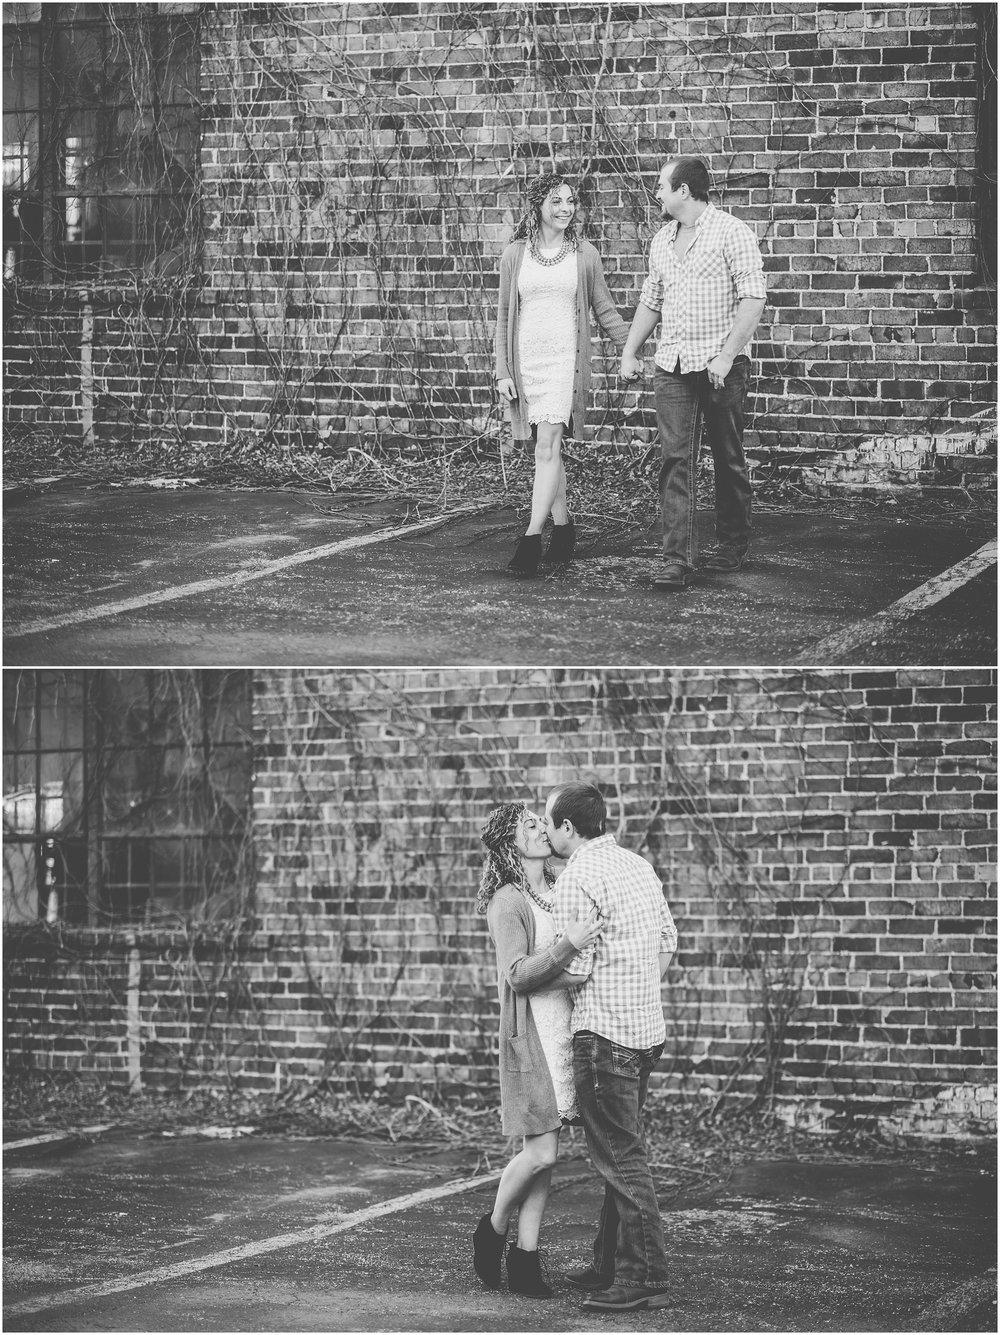 Kara Evans Photographer - Central Illinois Wedding Photographer - Springfield Engagement Session - Downtown Springfield Engagement Photos - Gietl Brothers Auto Body